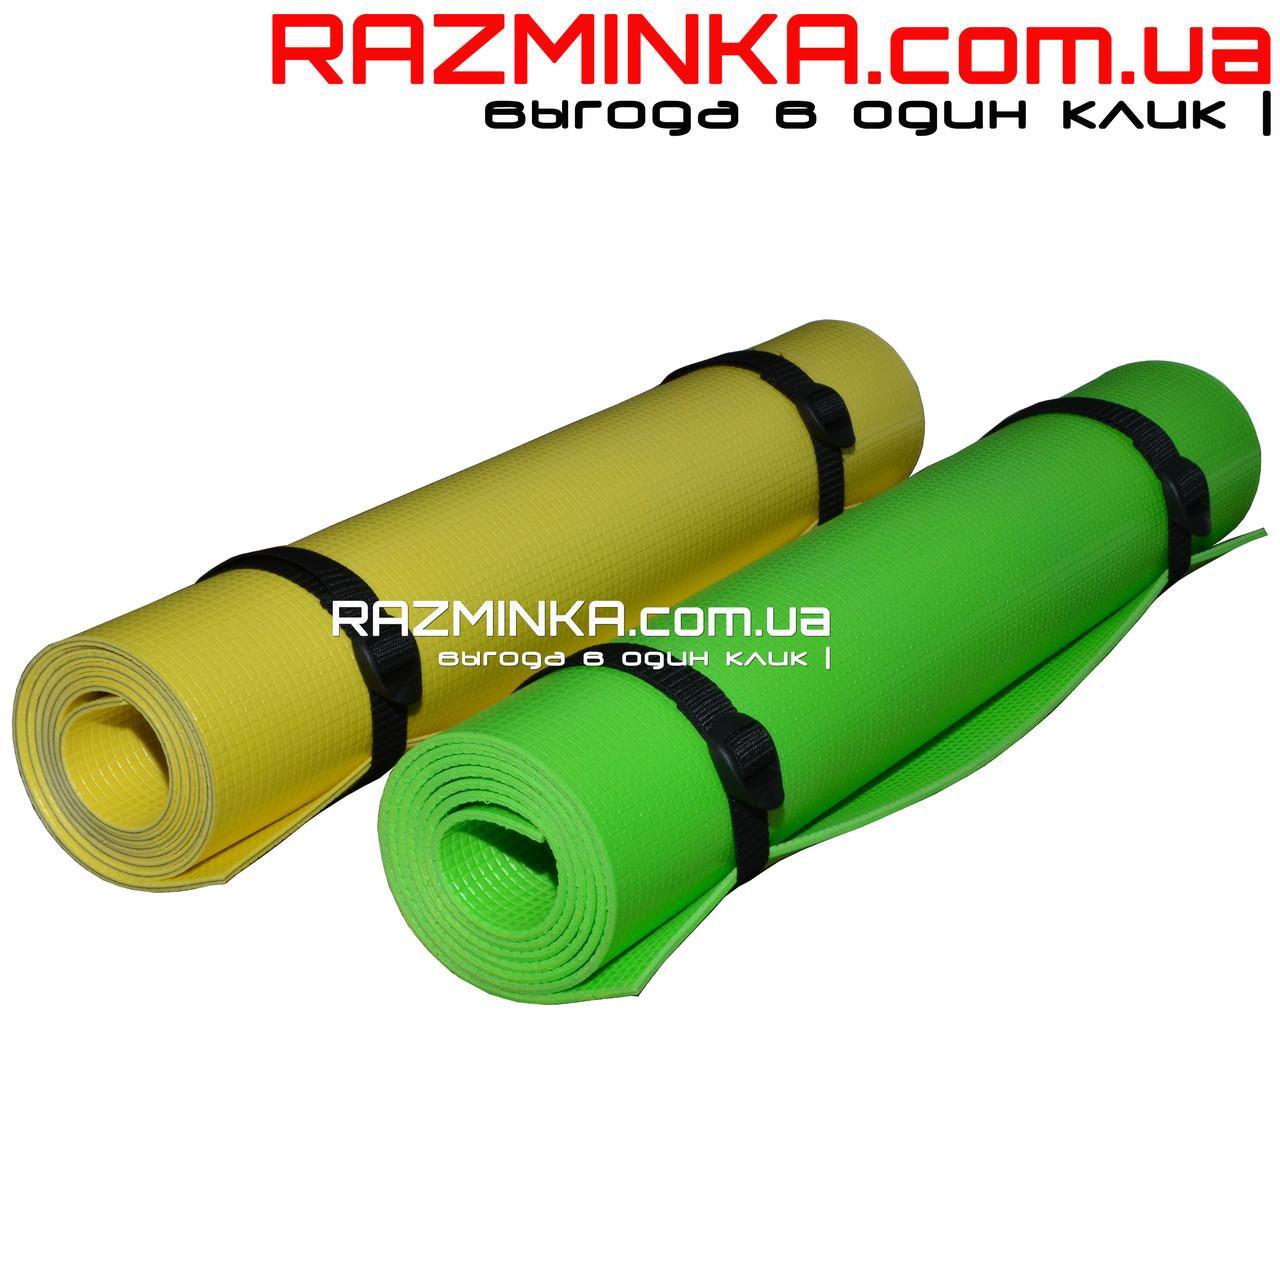 Коврик для йоги Premium 180х60см, толщина 4мм